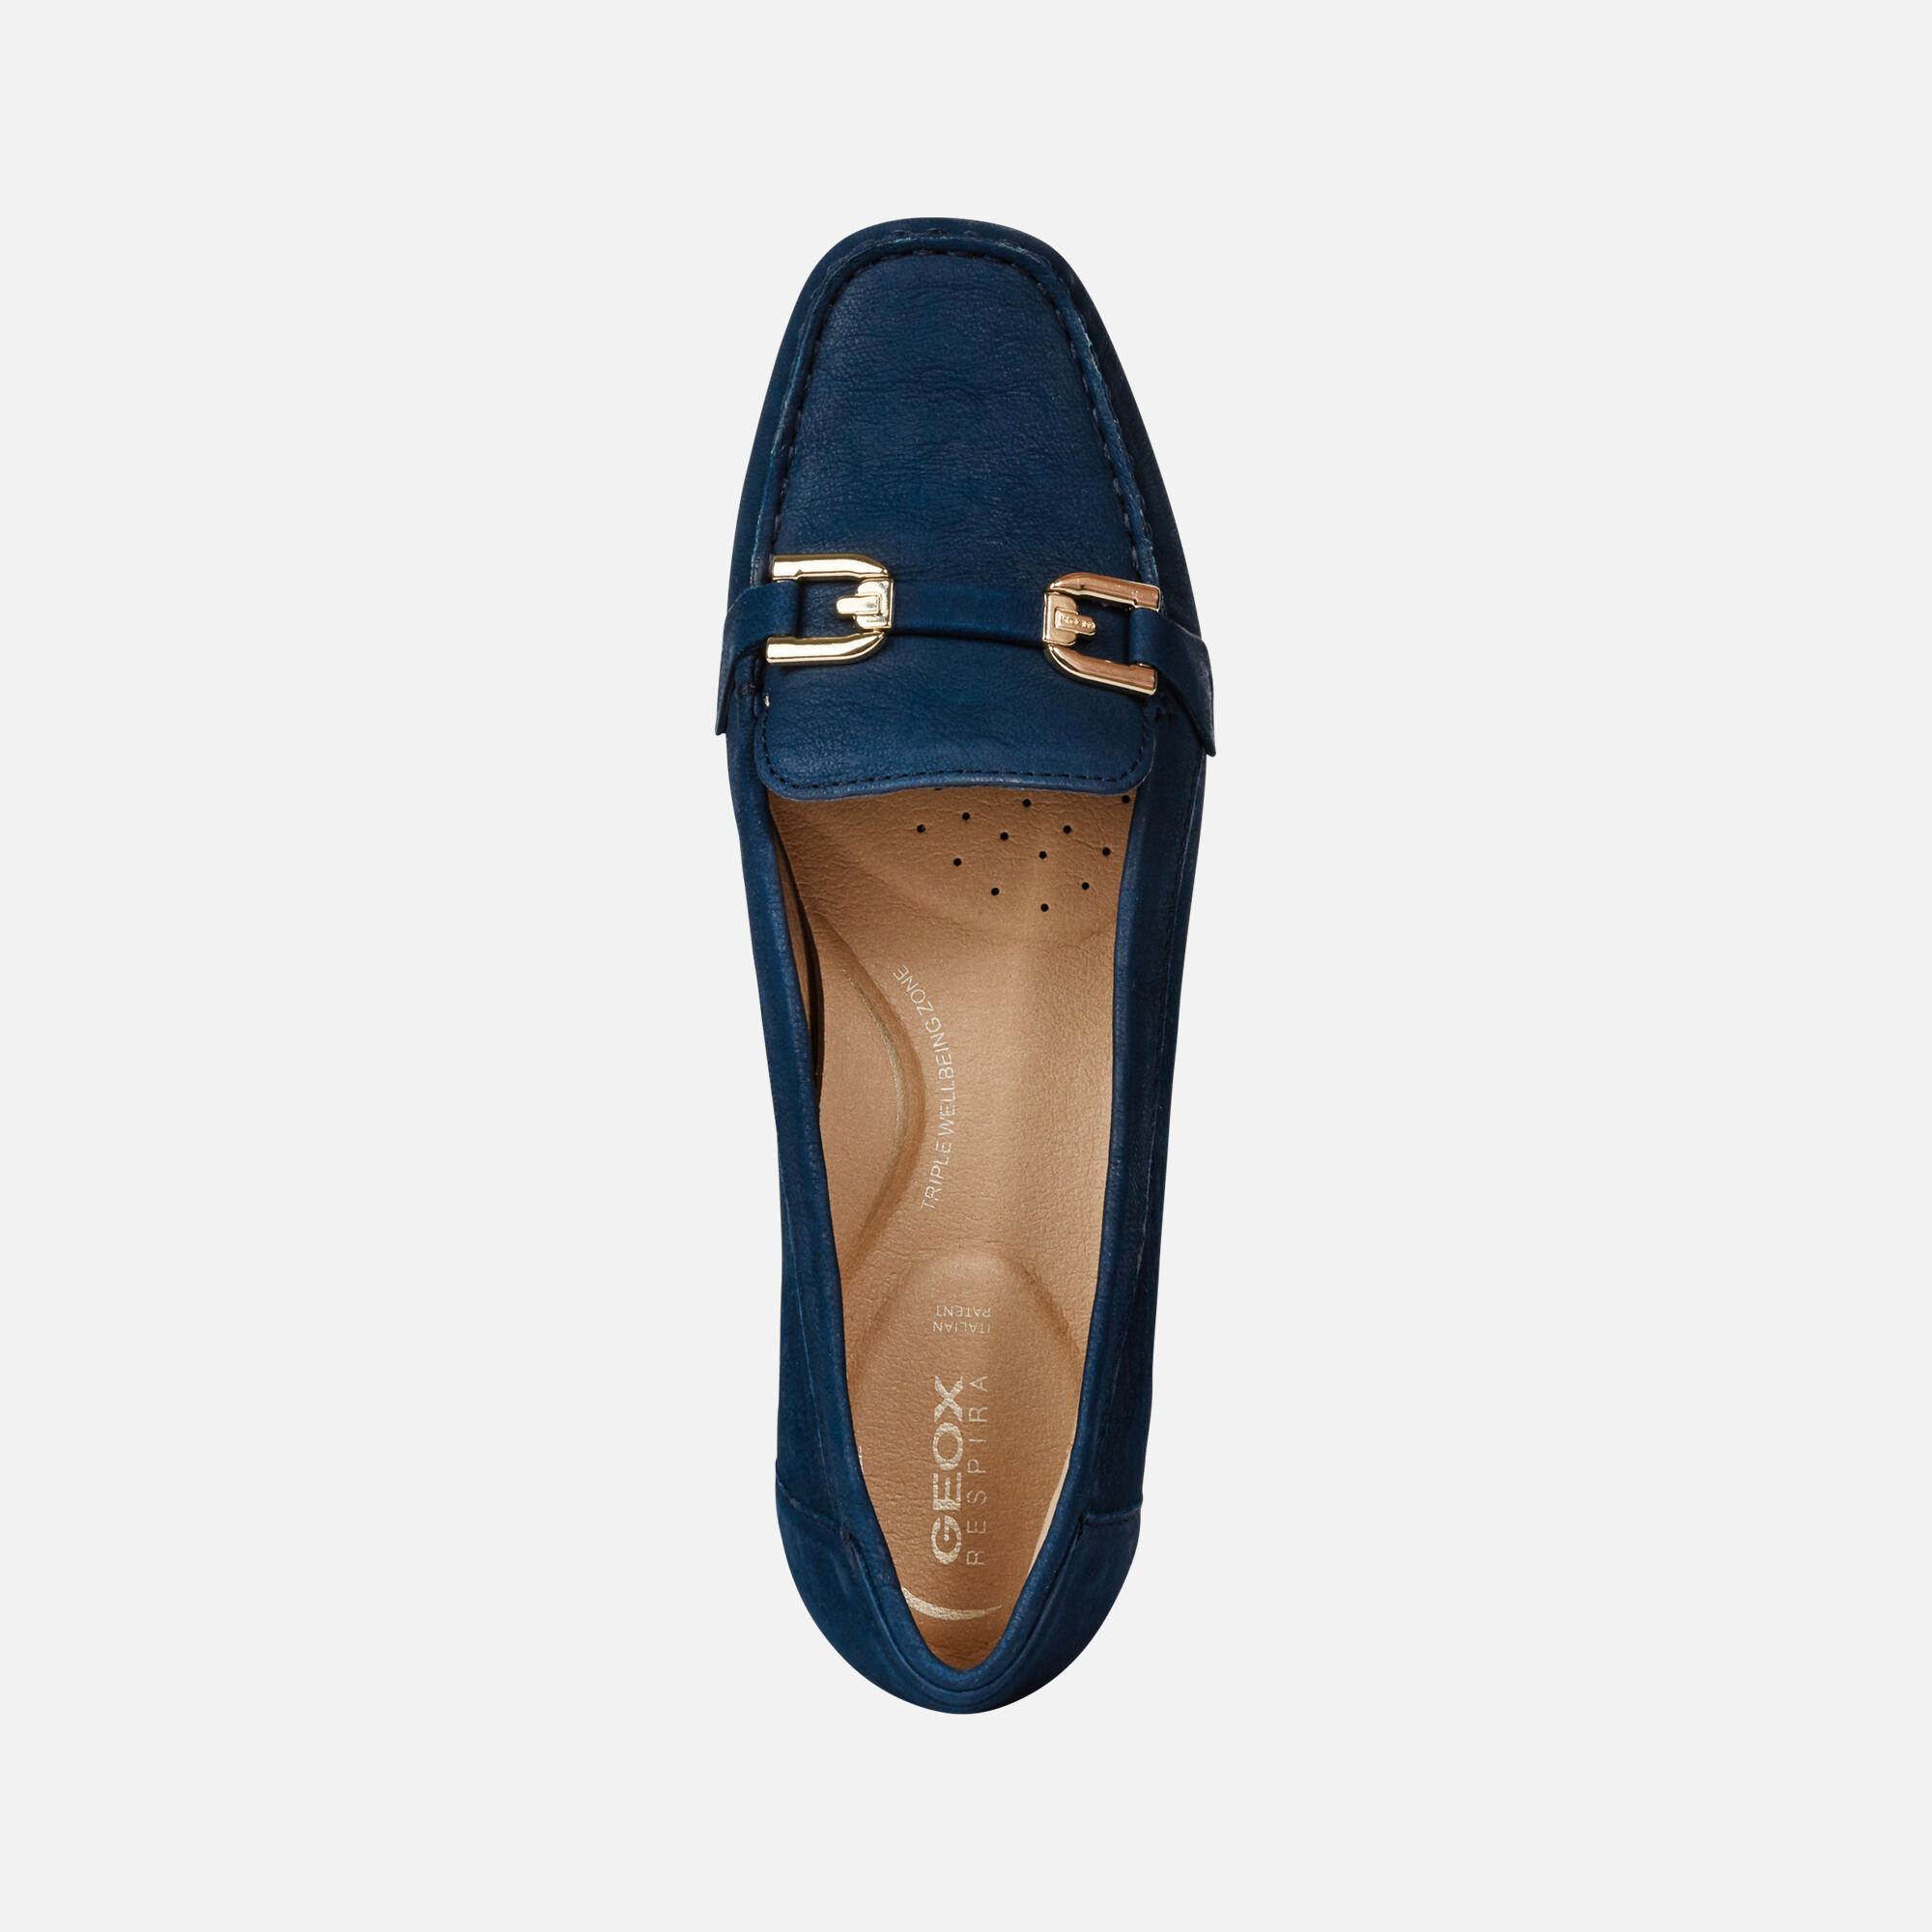 Geox D ANNYTAH MOC: Blue Woman Moccasins | Geox